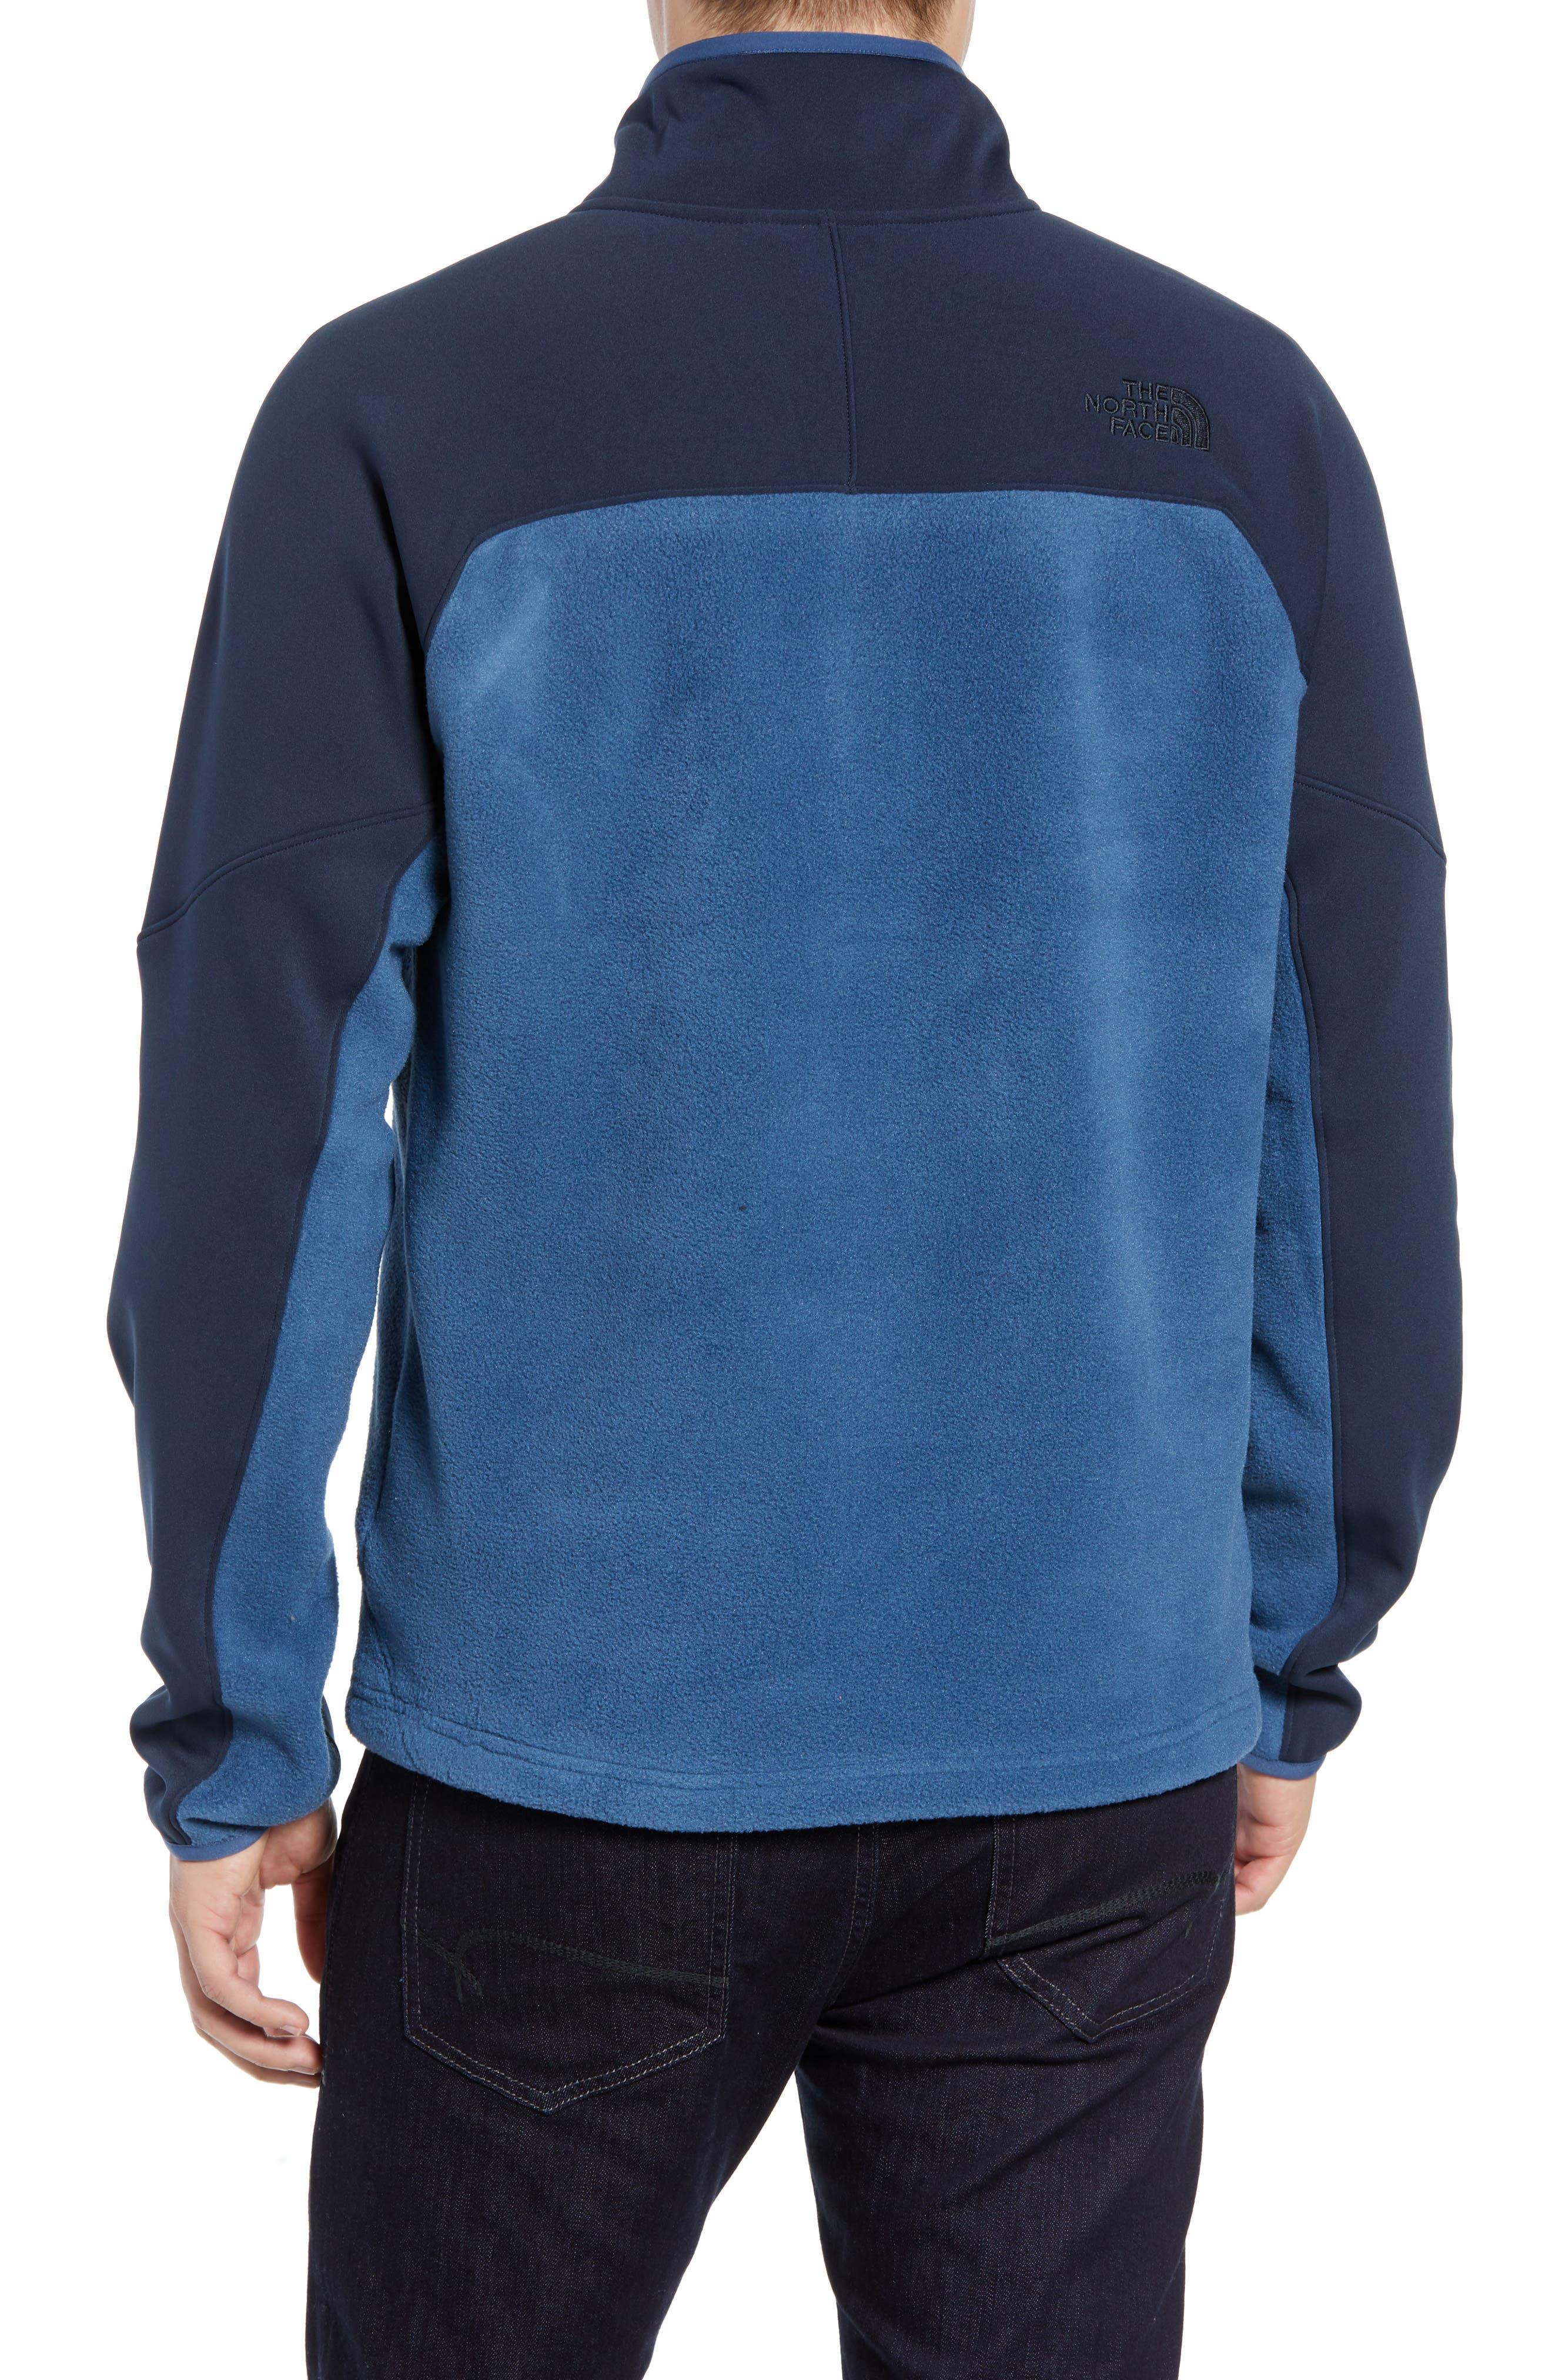 Tolmiepeak Hybrid Half-Zip Pullover,                             Alternate thumbnail 2, color,                             SHADY BLUE/ URBAN NAVY